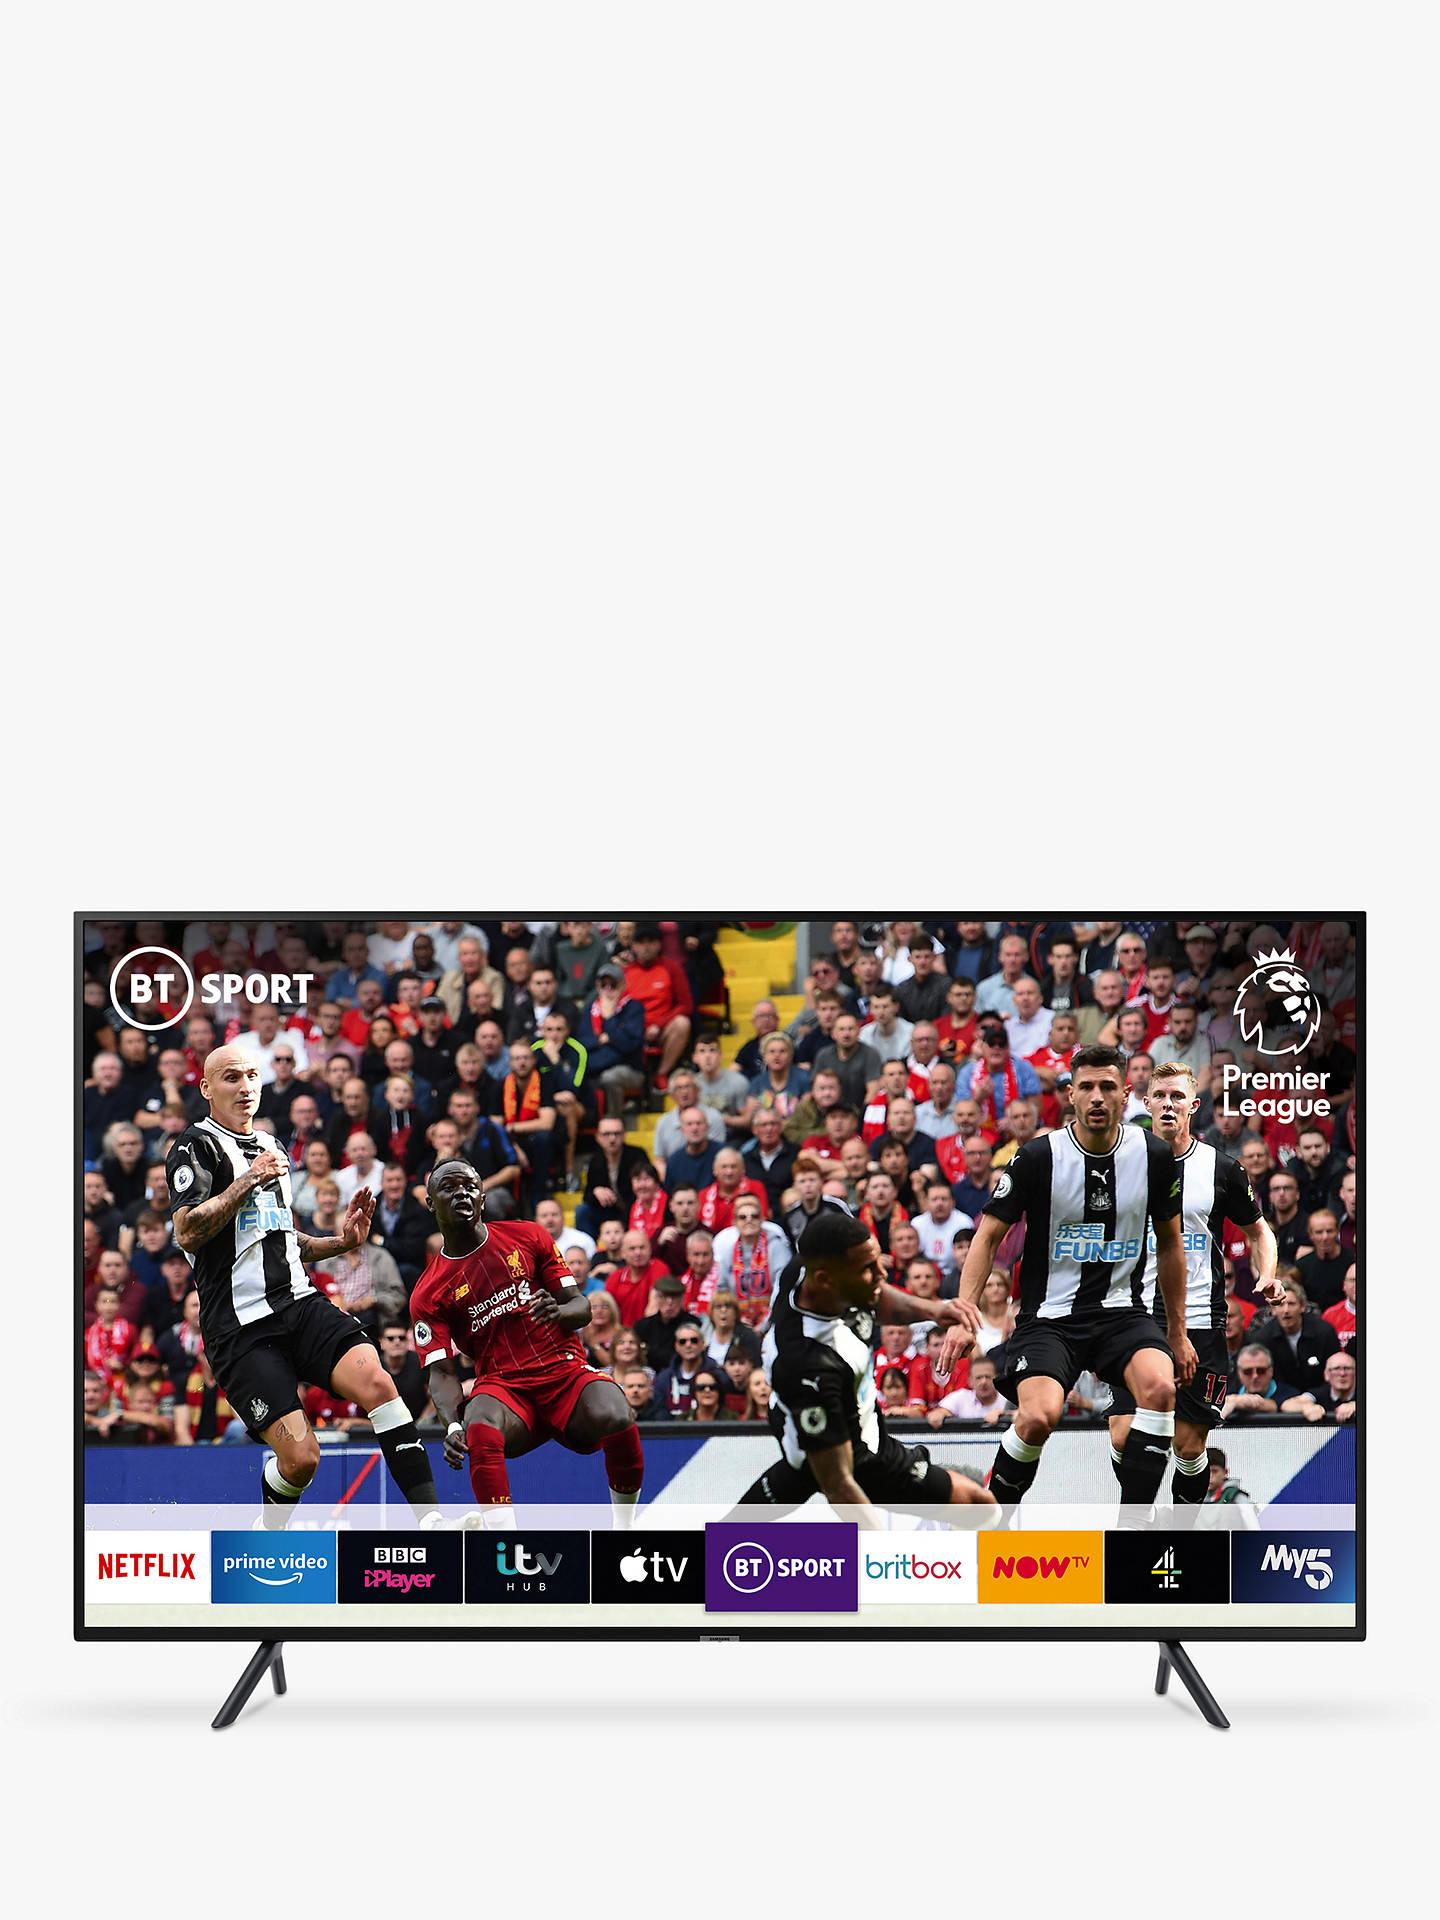 Samsung UE50RU7100 (2019) HDR 4K Ultra HD Smart TV, 50